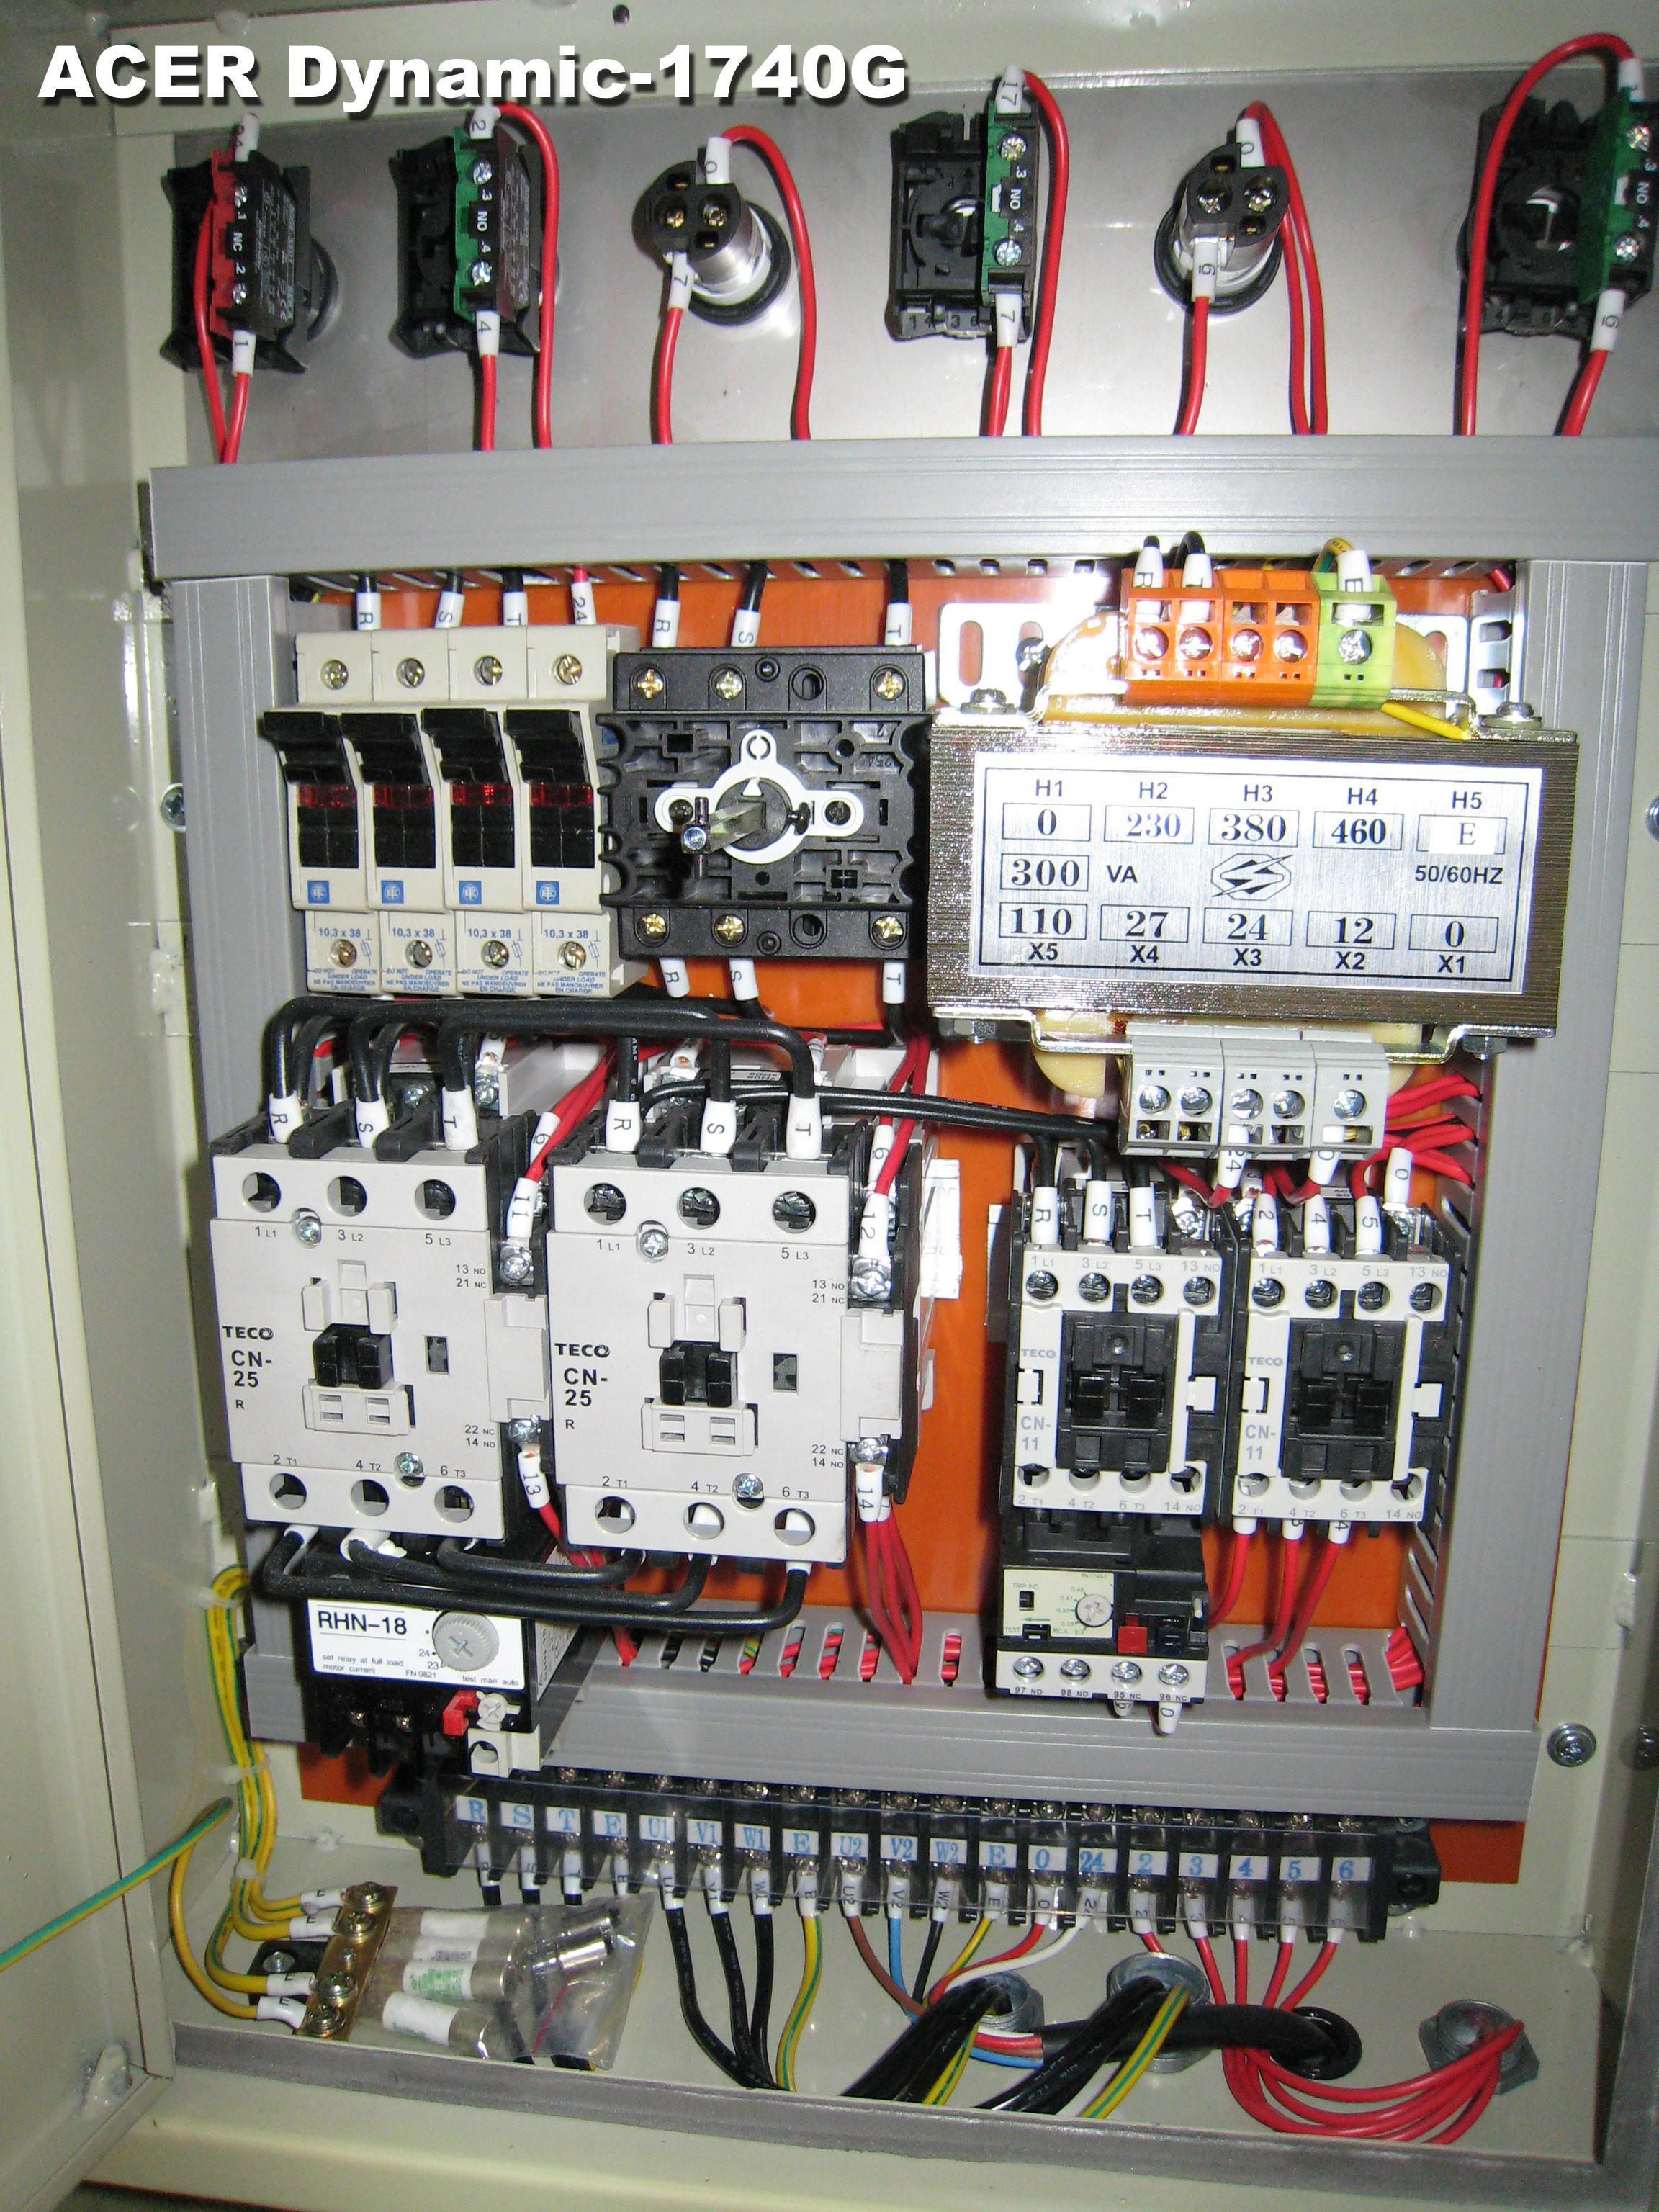 Electrical Control Panel Wiring Diagram | Manual E-Books - Electrical Panel Wiring Diagram